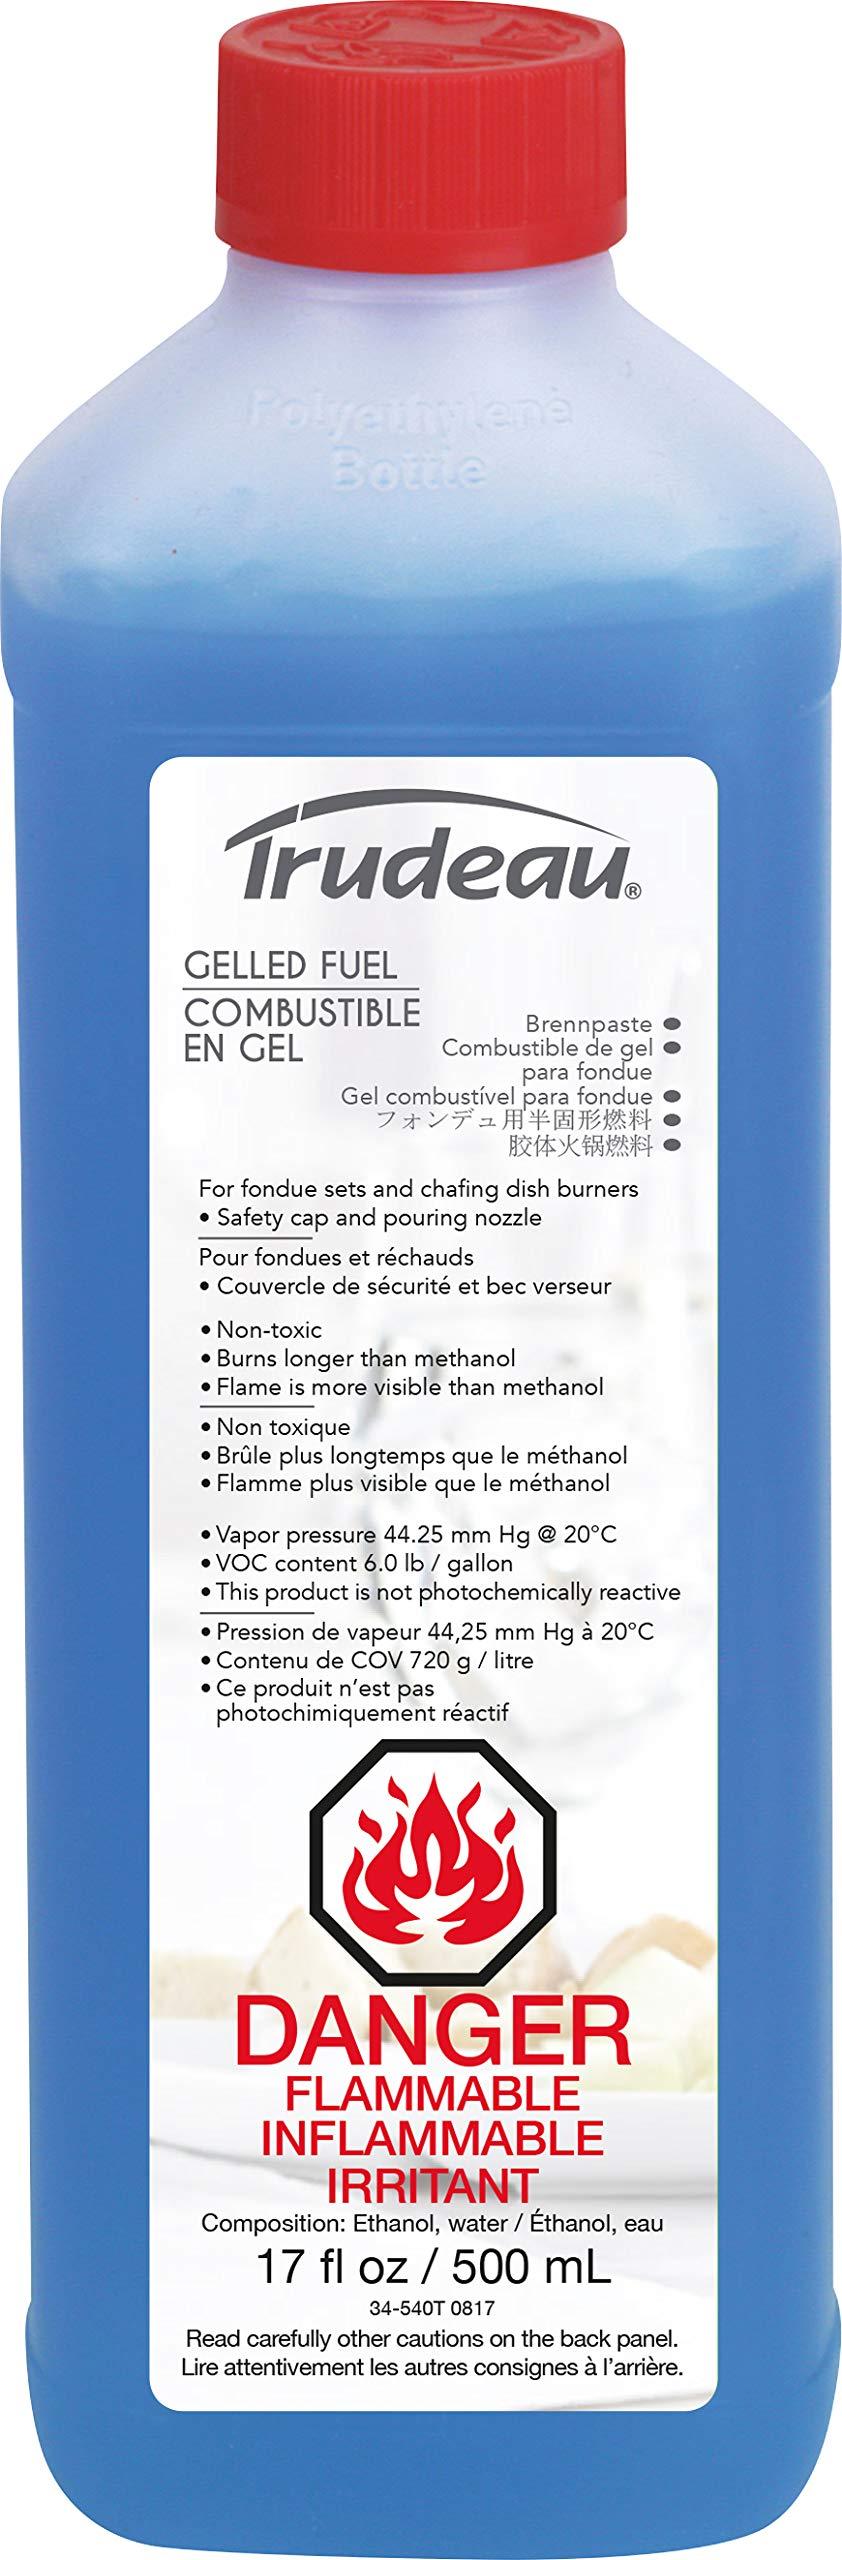 Trudeau 082337 Gelled Fuel, 17 oz, Blue by Trudeau